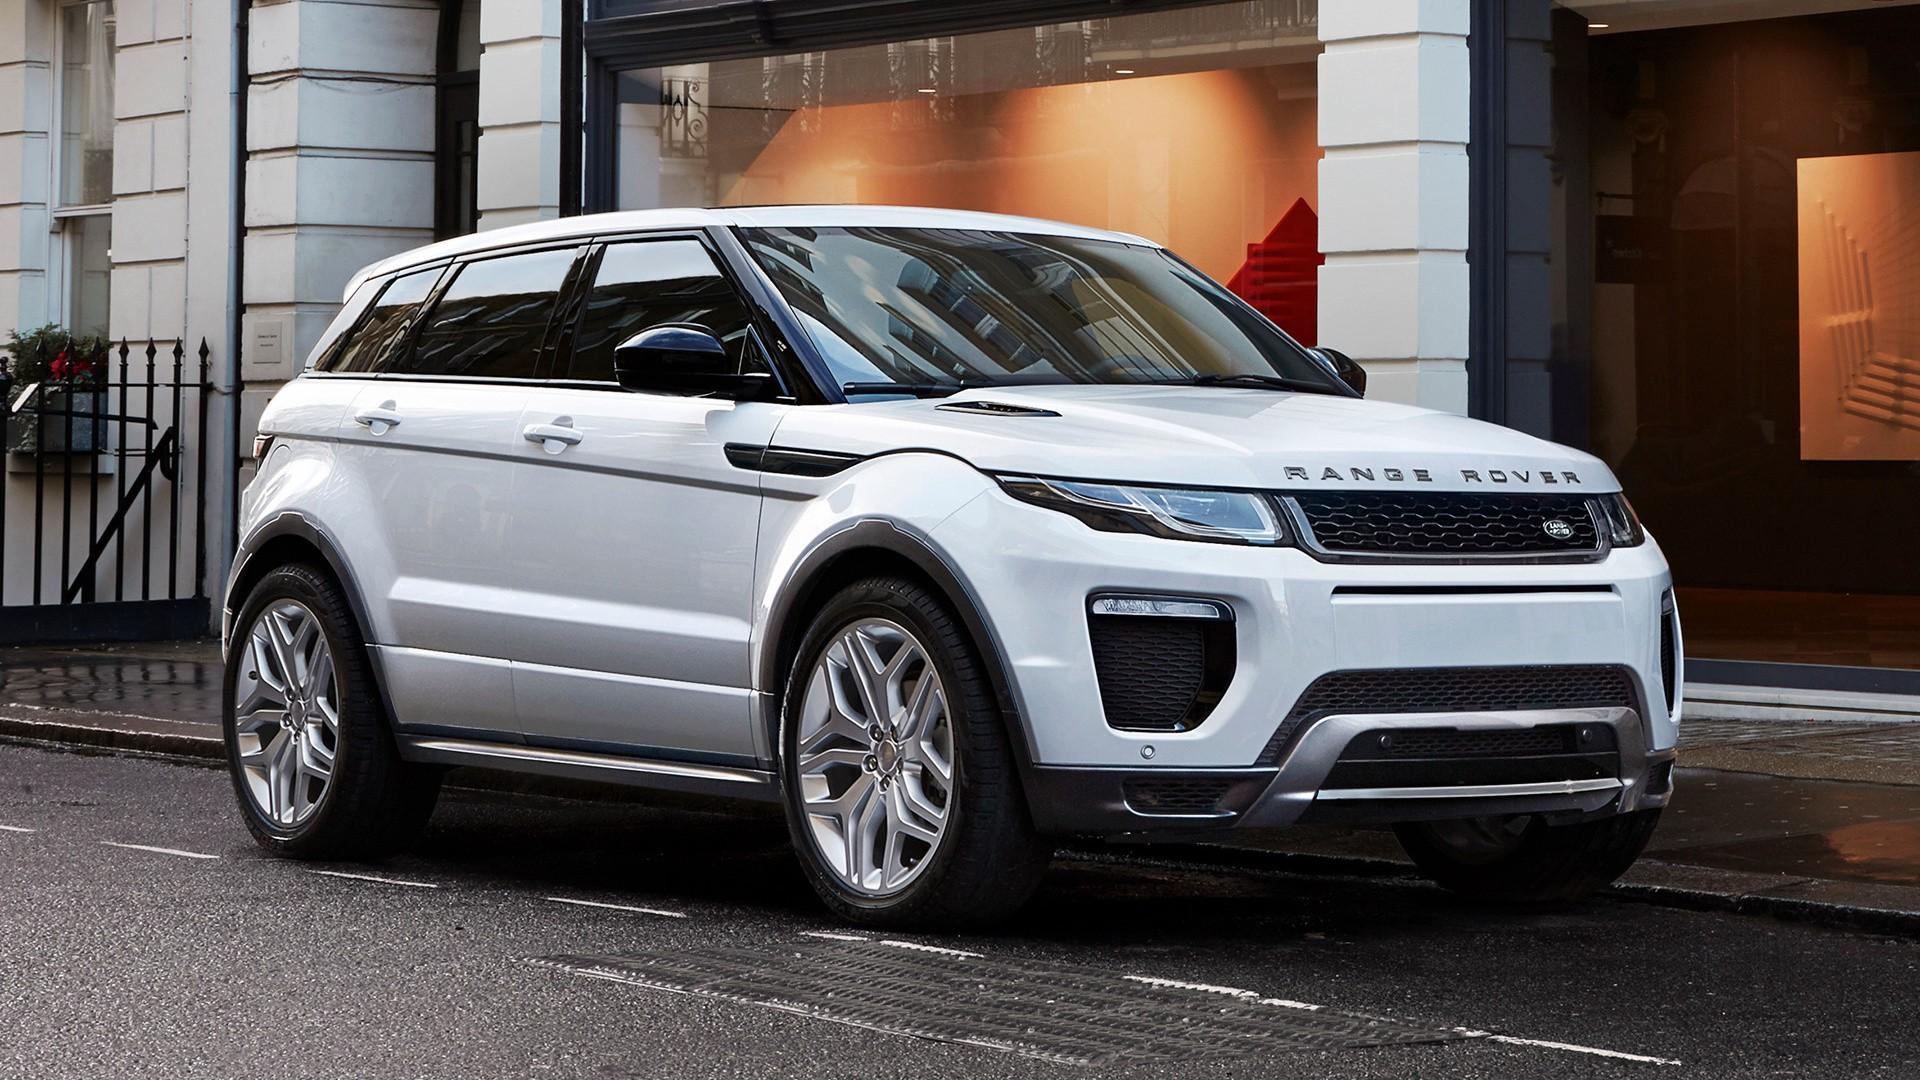 В Украине начались продажи Range Rover Evoque